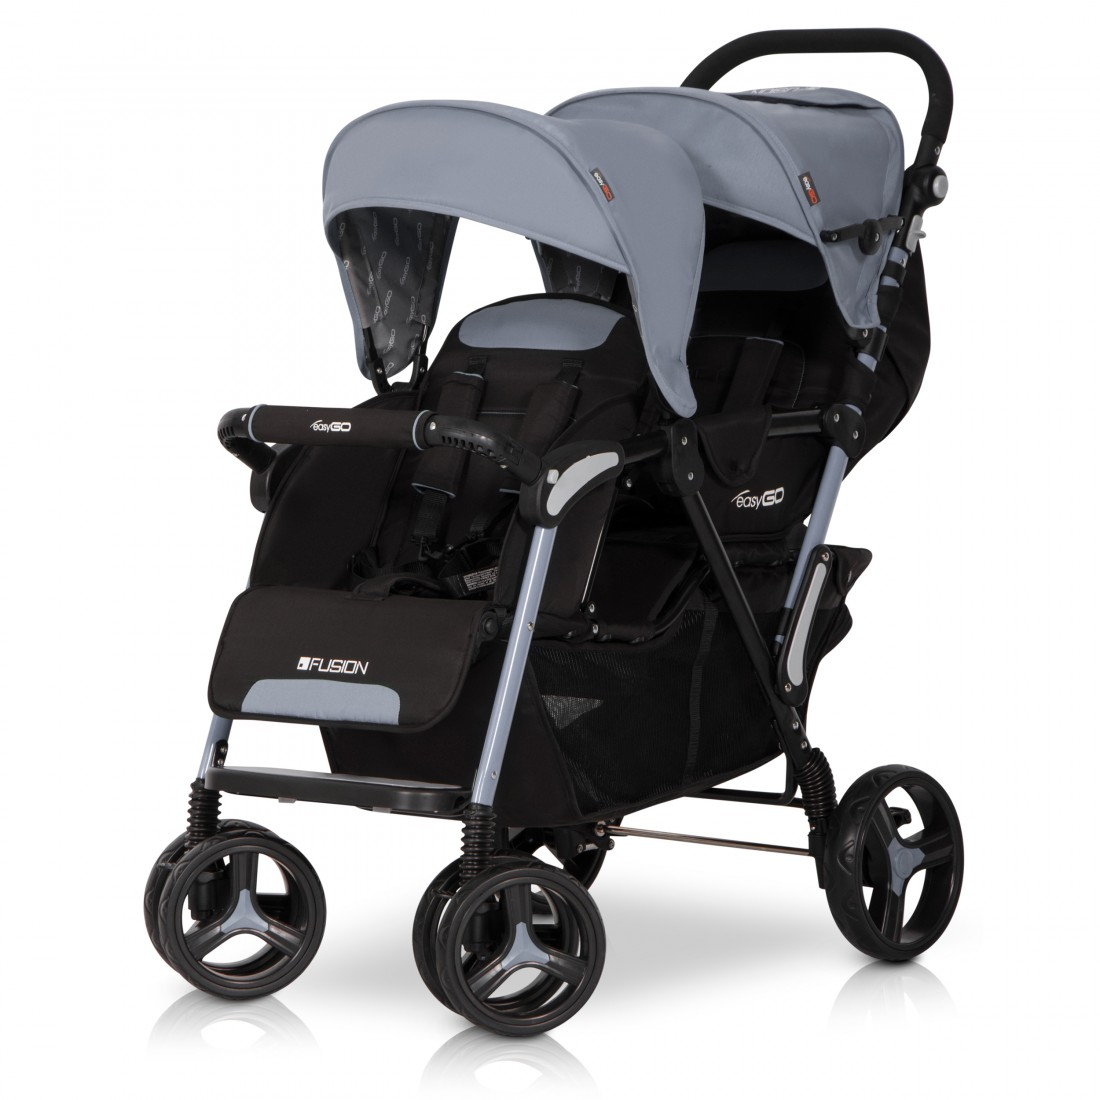 fusion geschwisterwagen baby zwillingsbuggy kinderwagen. Black Bedroom Furniture Sets. Home Design Ideas